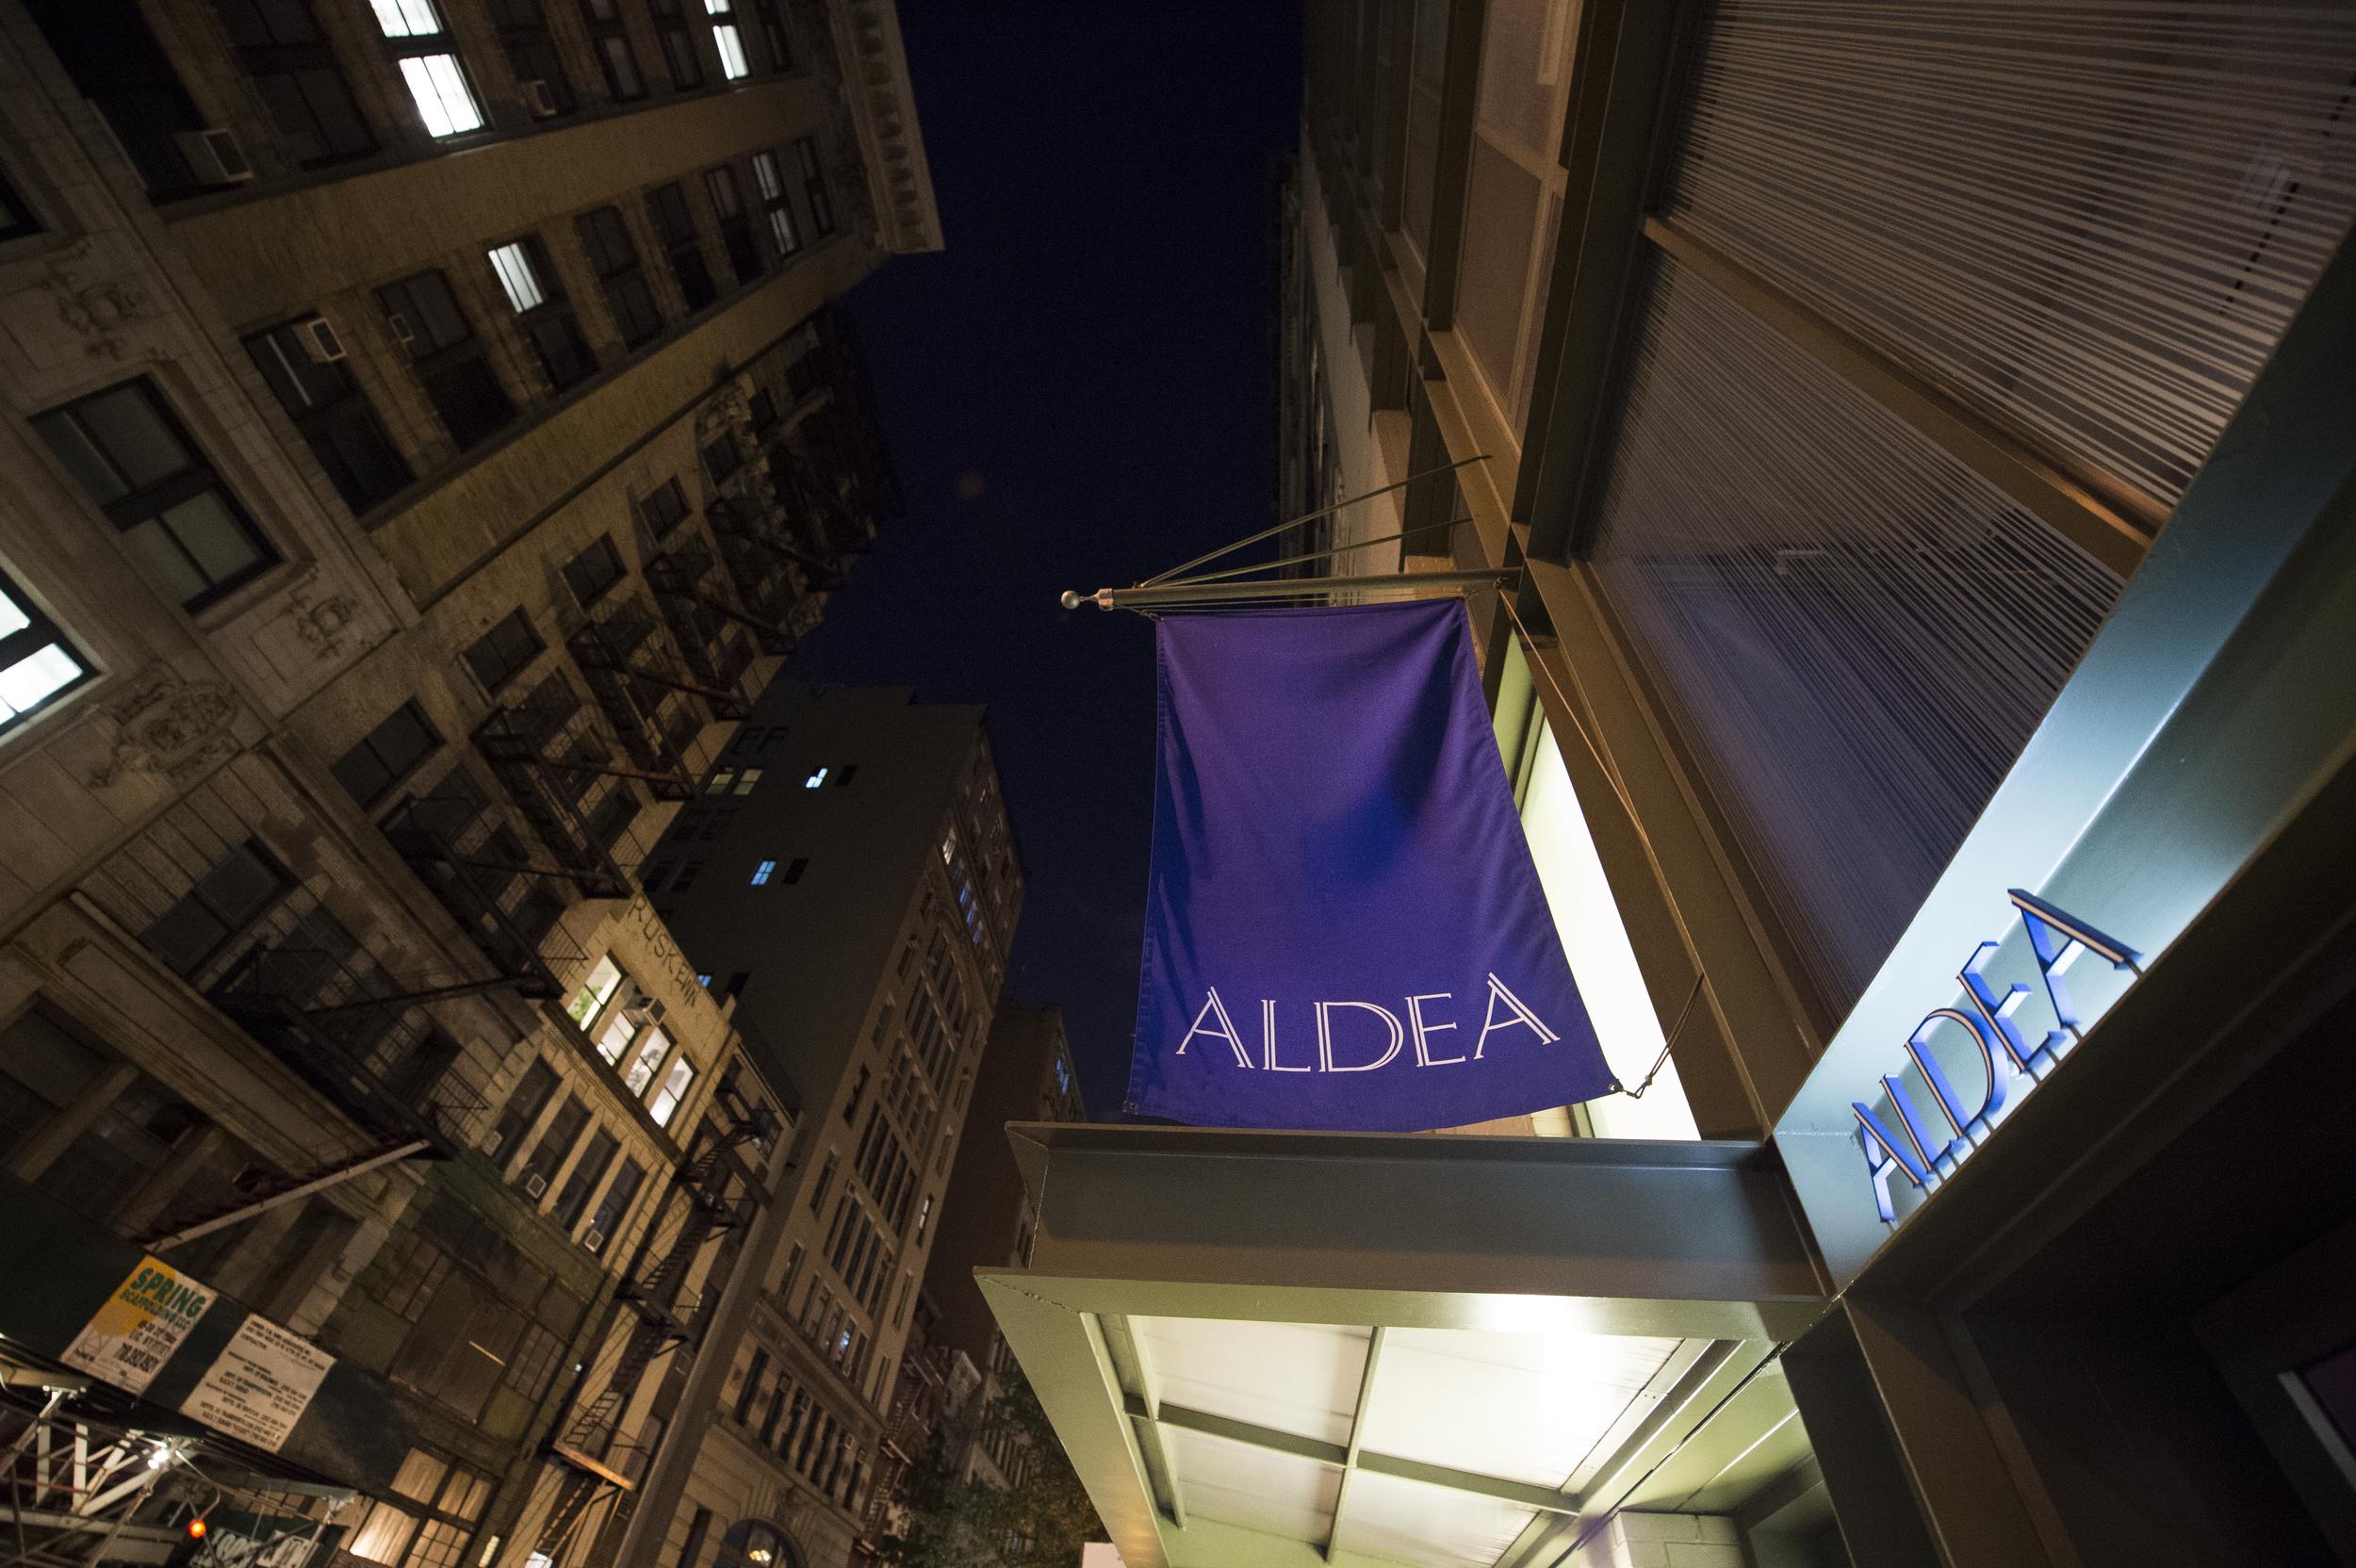 Aldea Bar